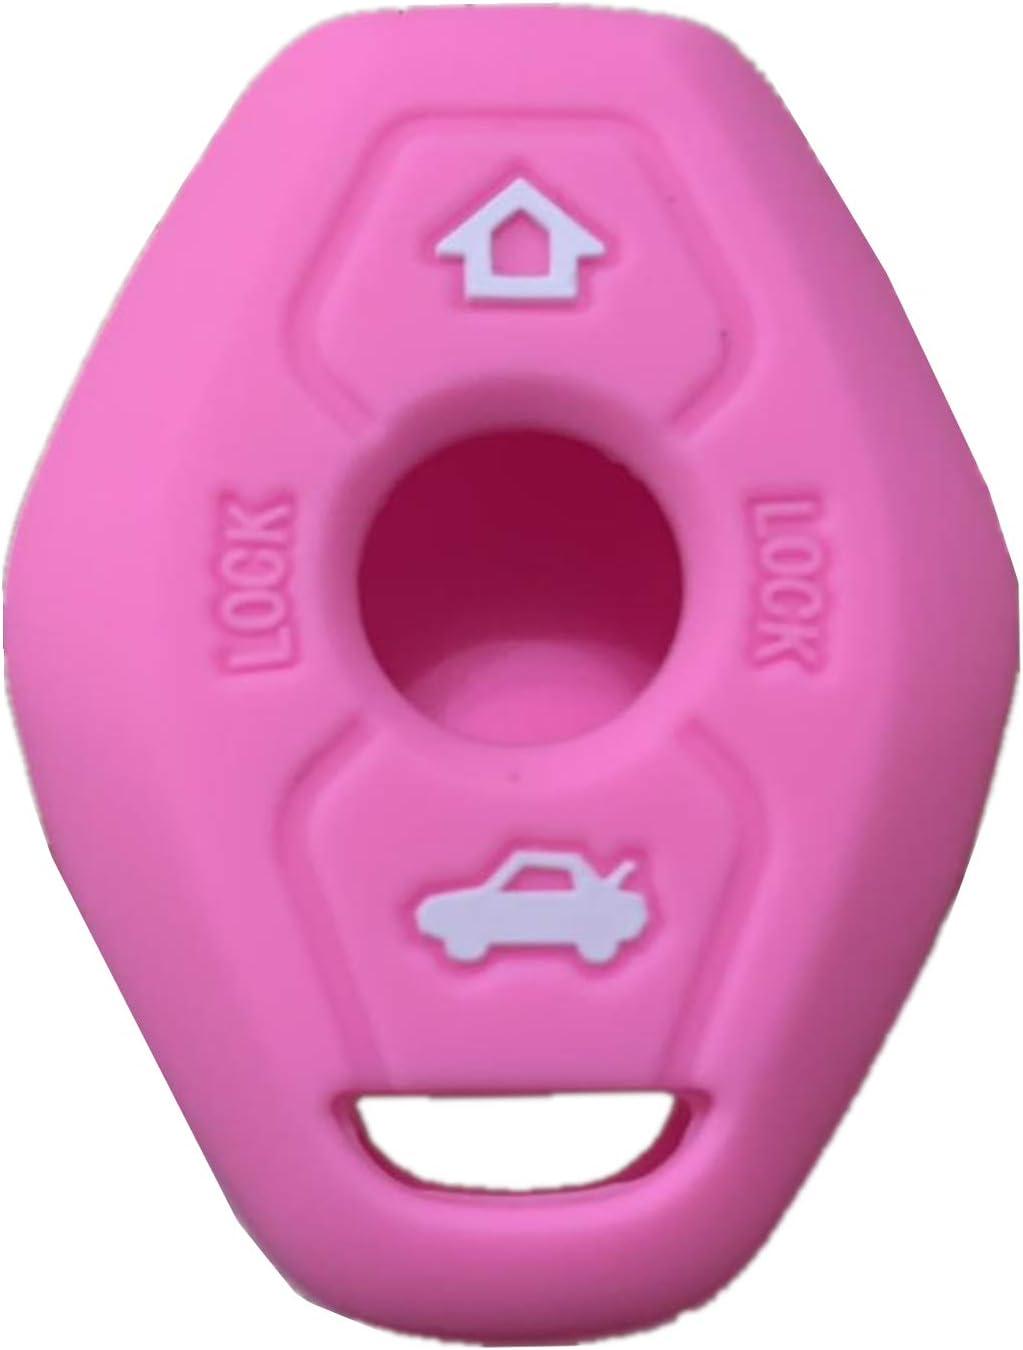 Rpkey Silicone Keyless Entry Remote Control Key Fob Cover Case protector For BMW 3 5 7 Series M3 M5 M6 X3 X5 Z3 Z4 Z8 LX8FZV